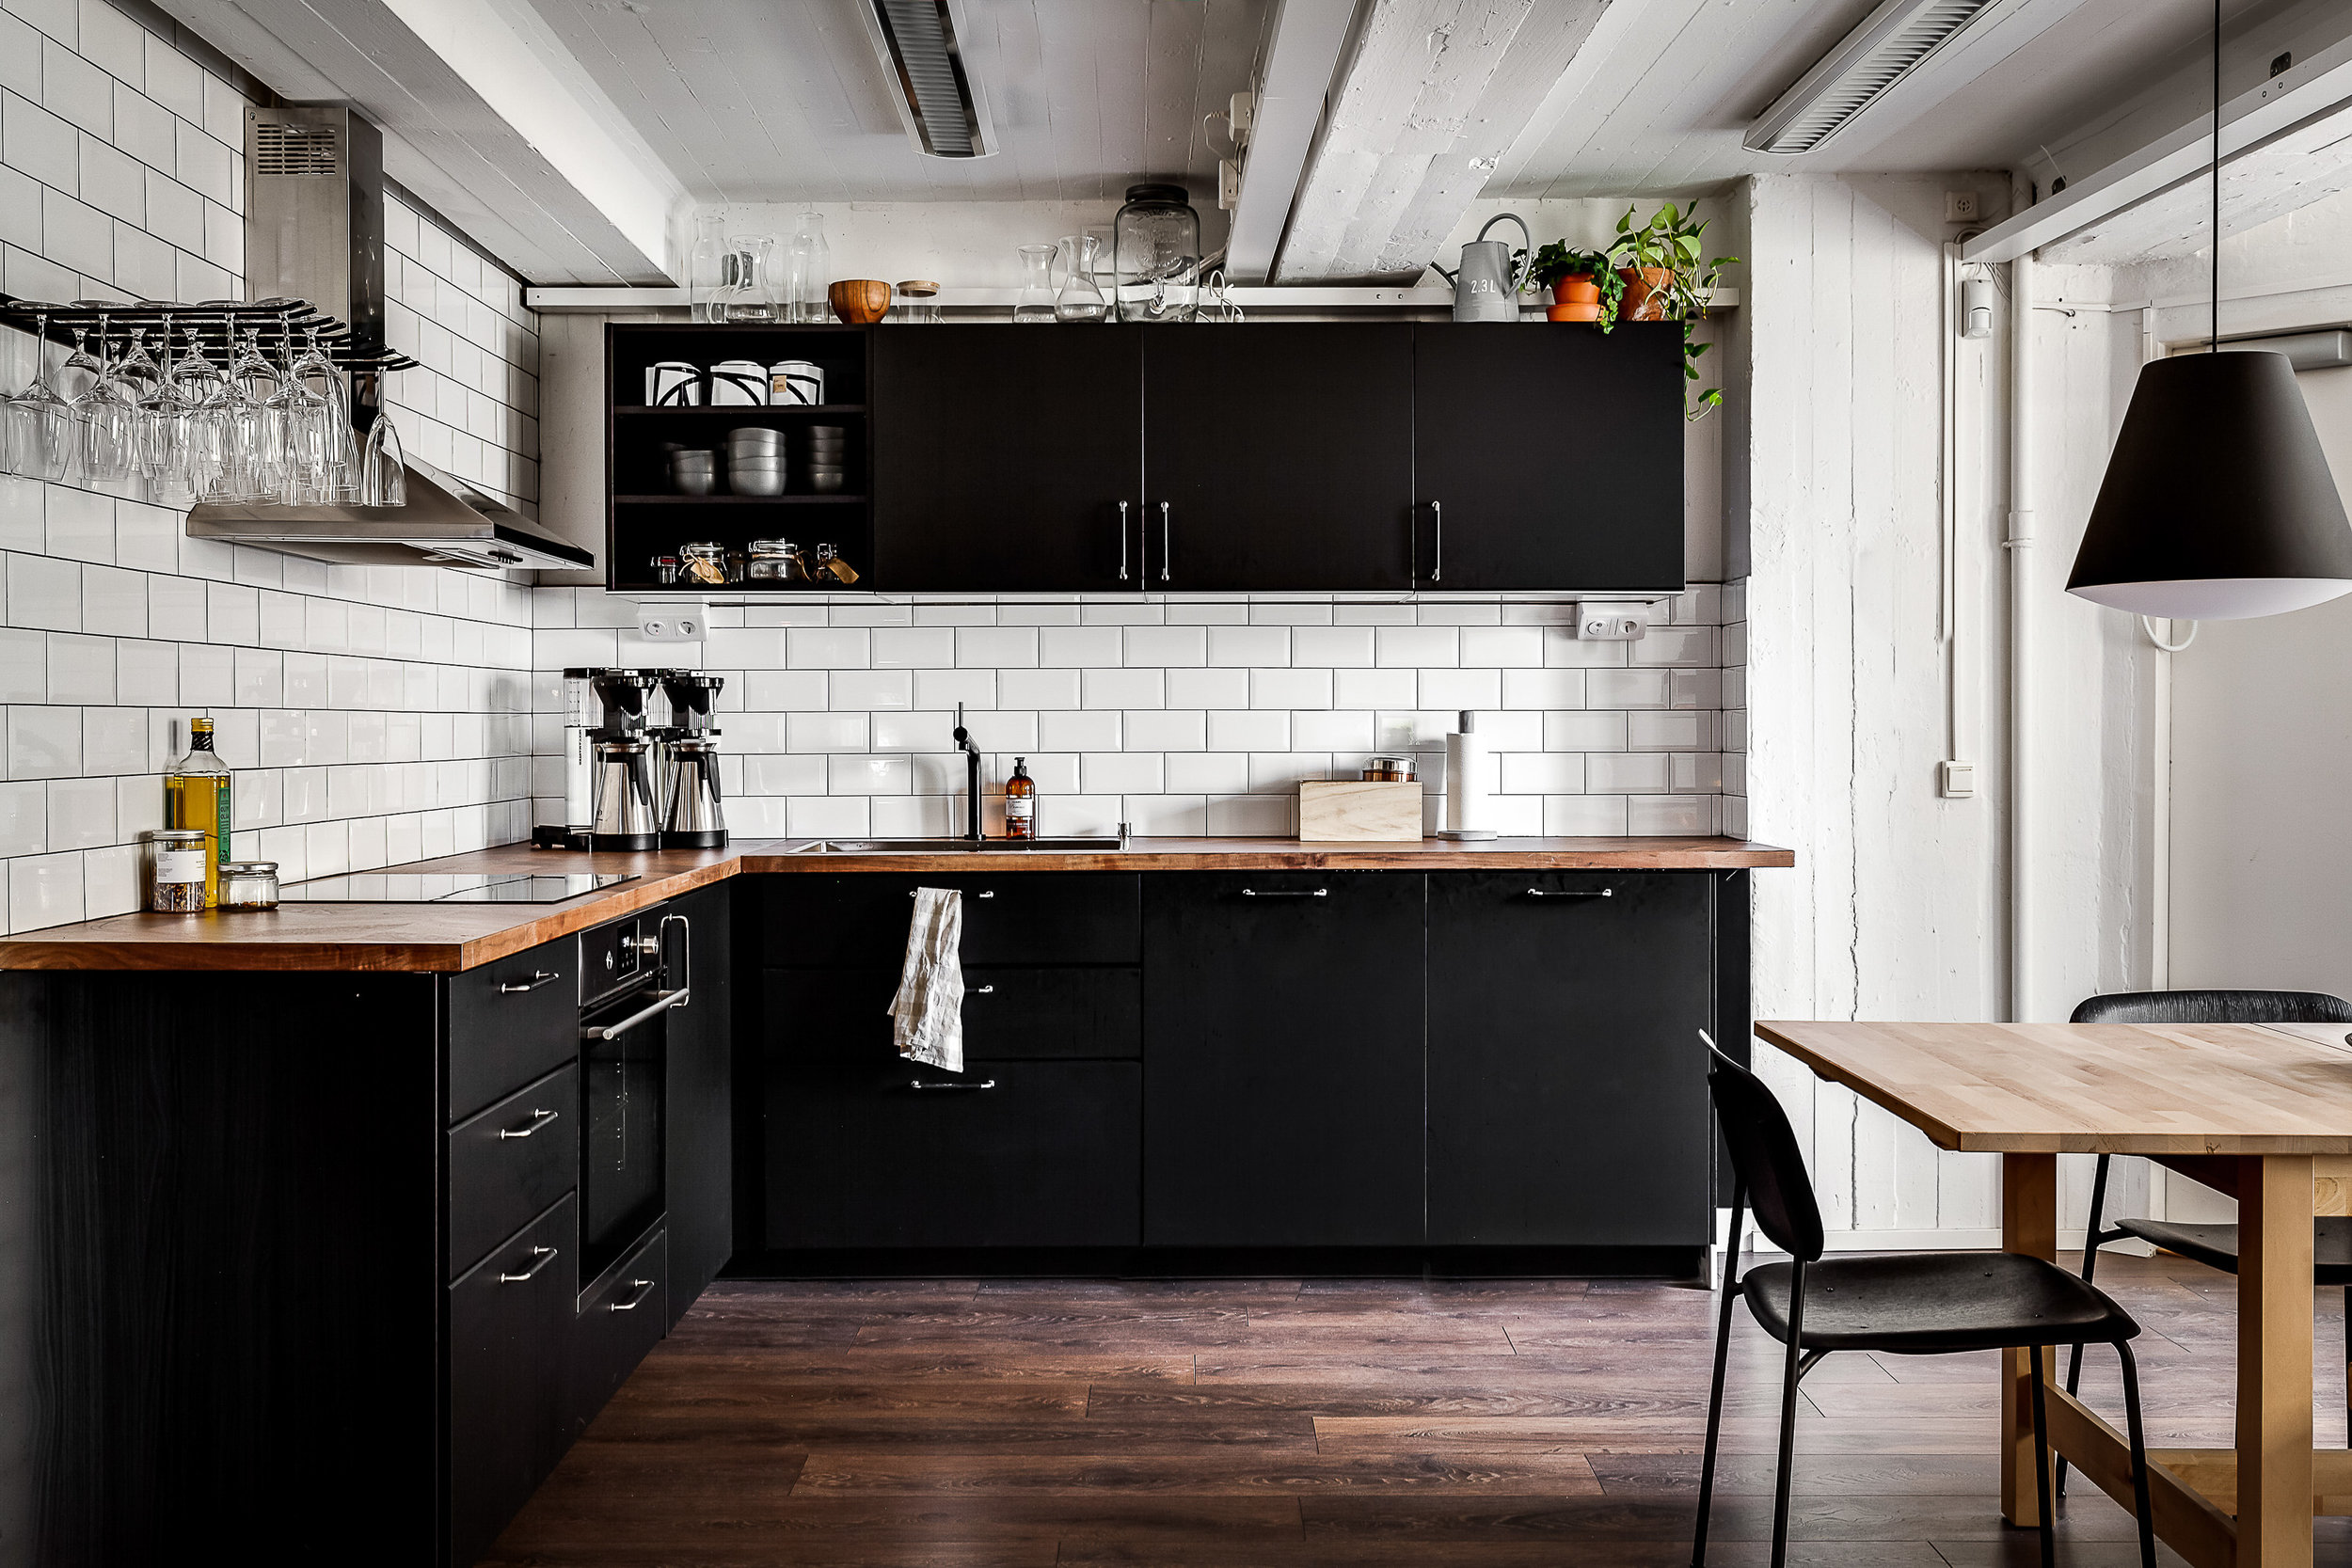 Kök i industristil. Foto Petter Fällström.